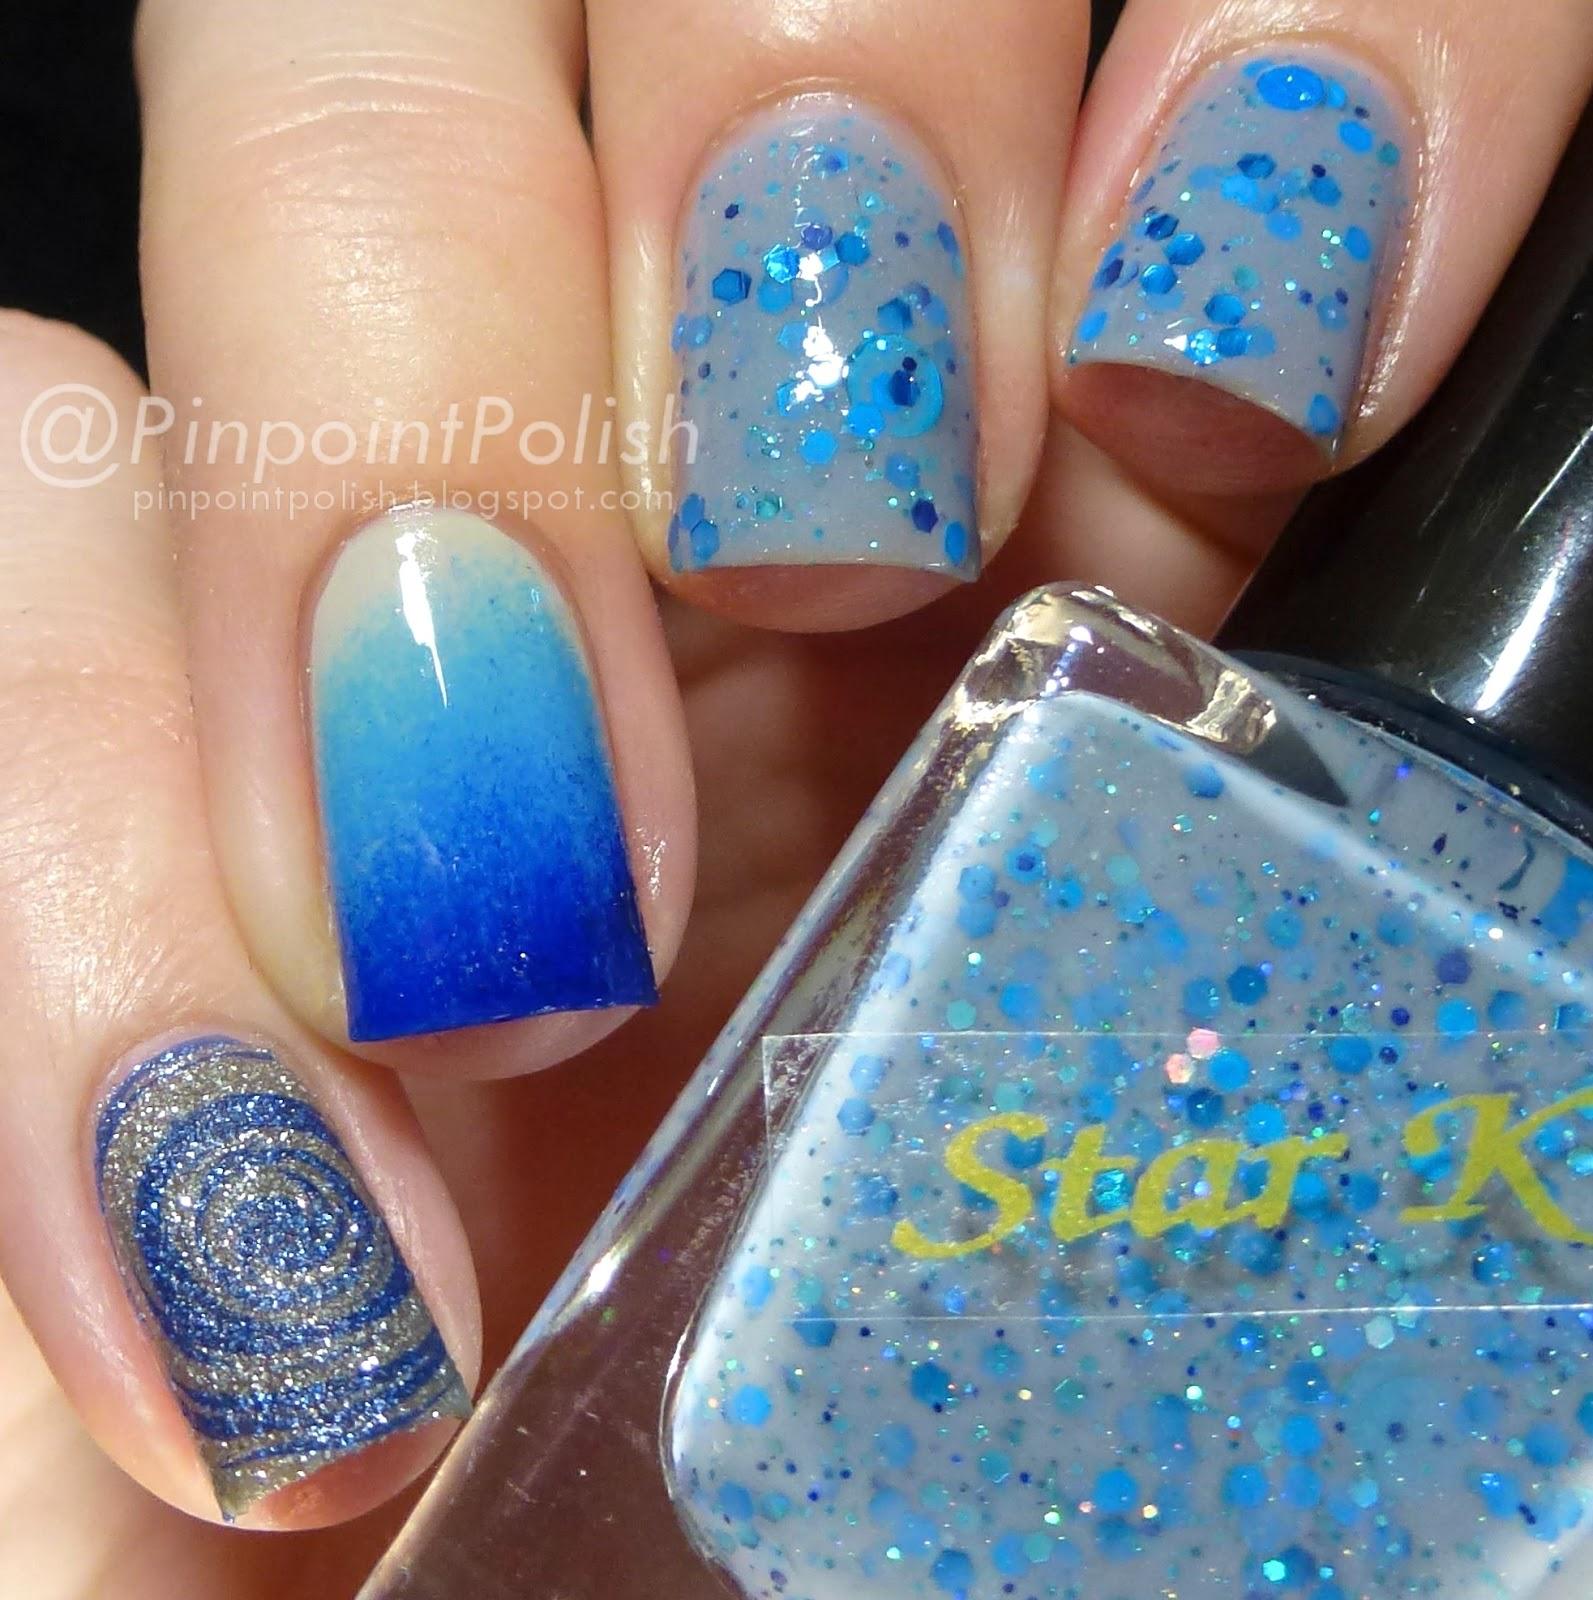 Star Kin Sunny Day Rain, swatch, Skittlette